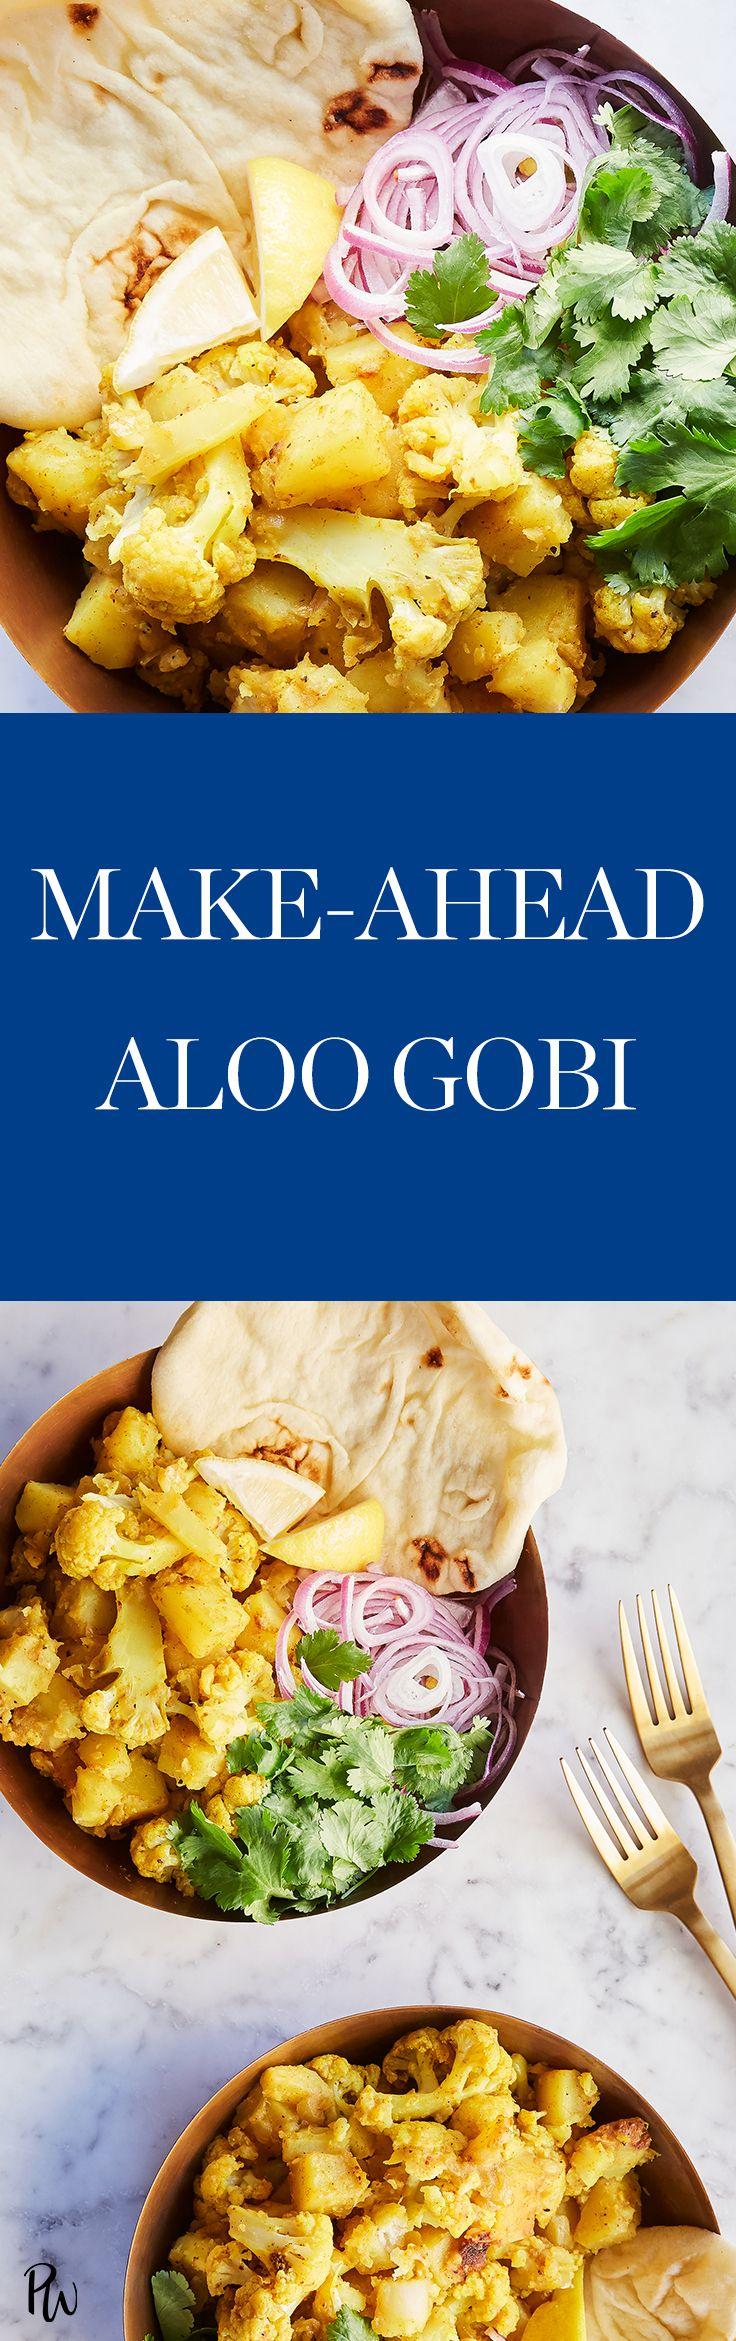 Make-Ahead Aloo Gobi Make-Ahead Aloo Gobi